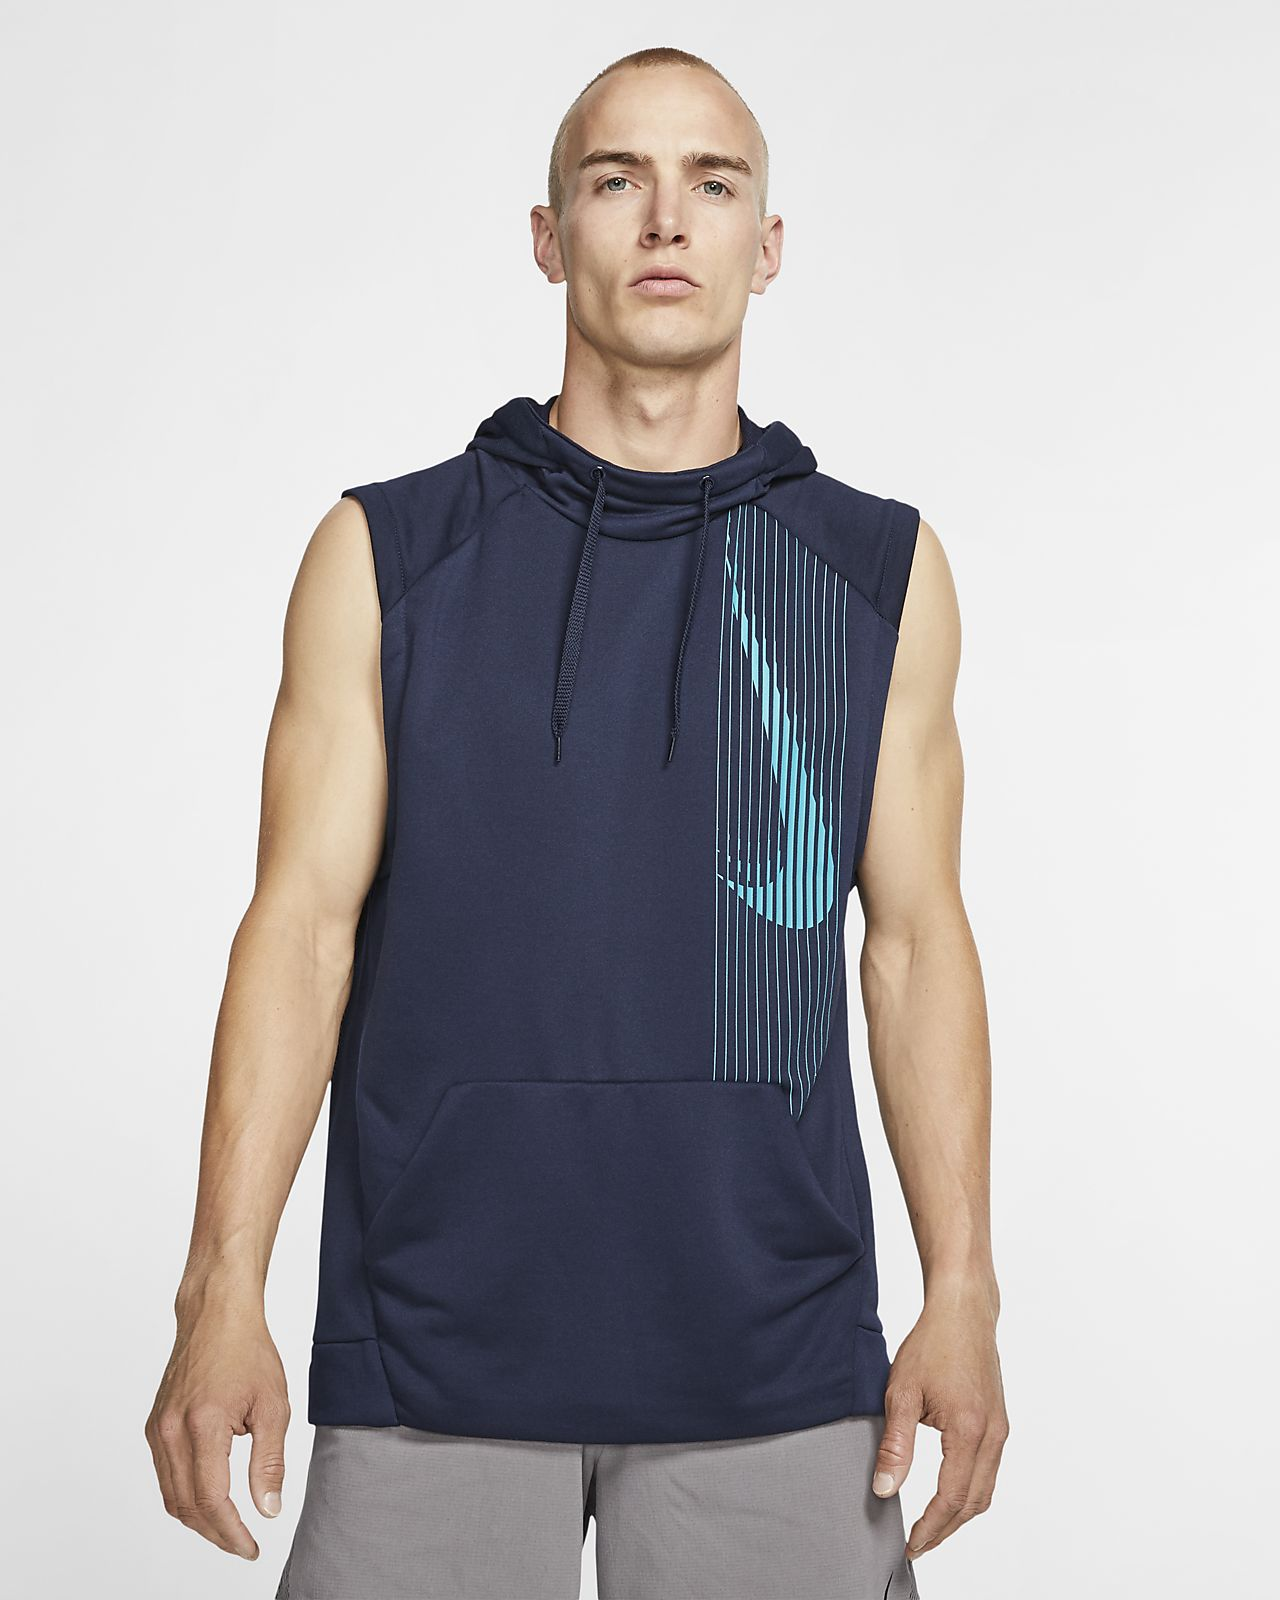 f8cb90adfe83e Nike Dri-FIT Men s Sleeveless Training Hoodie. Nike.com